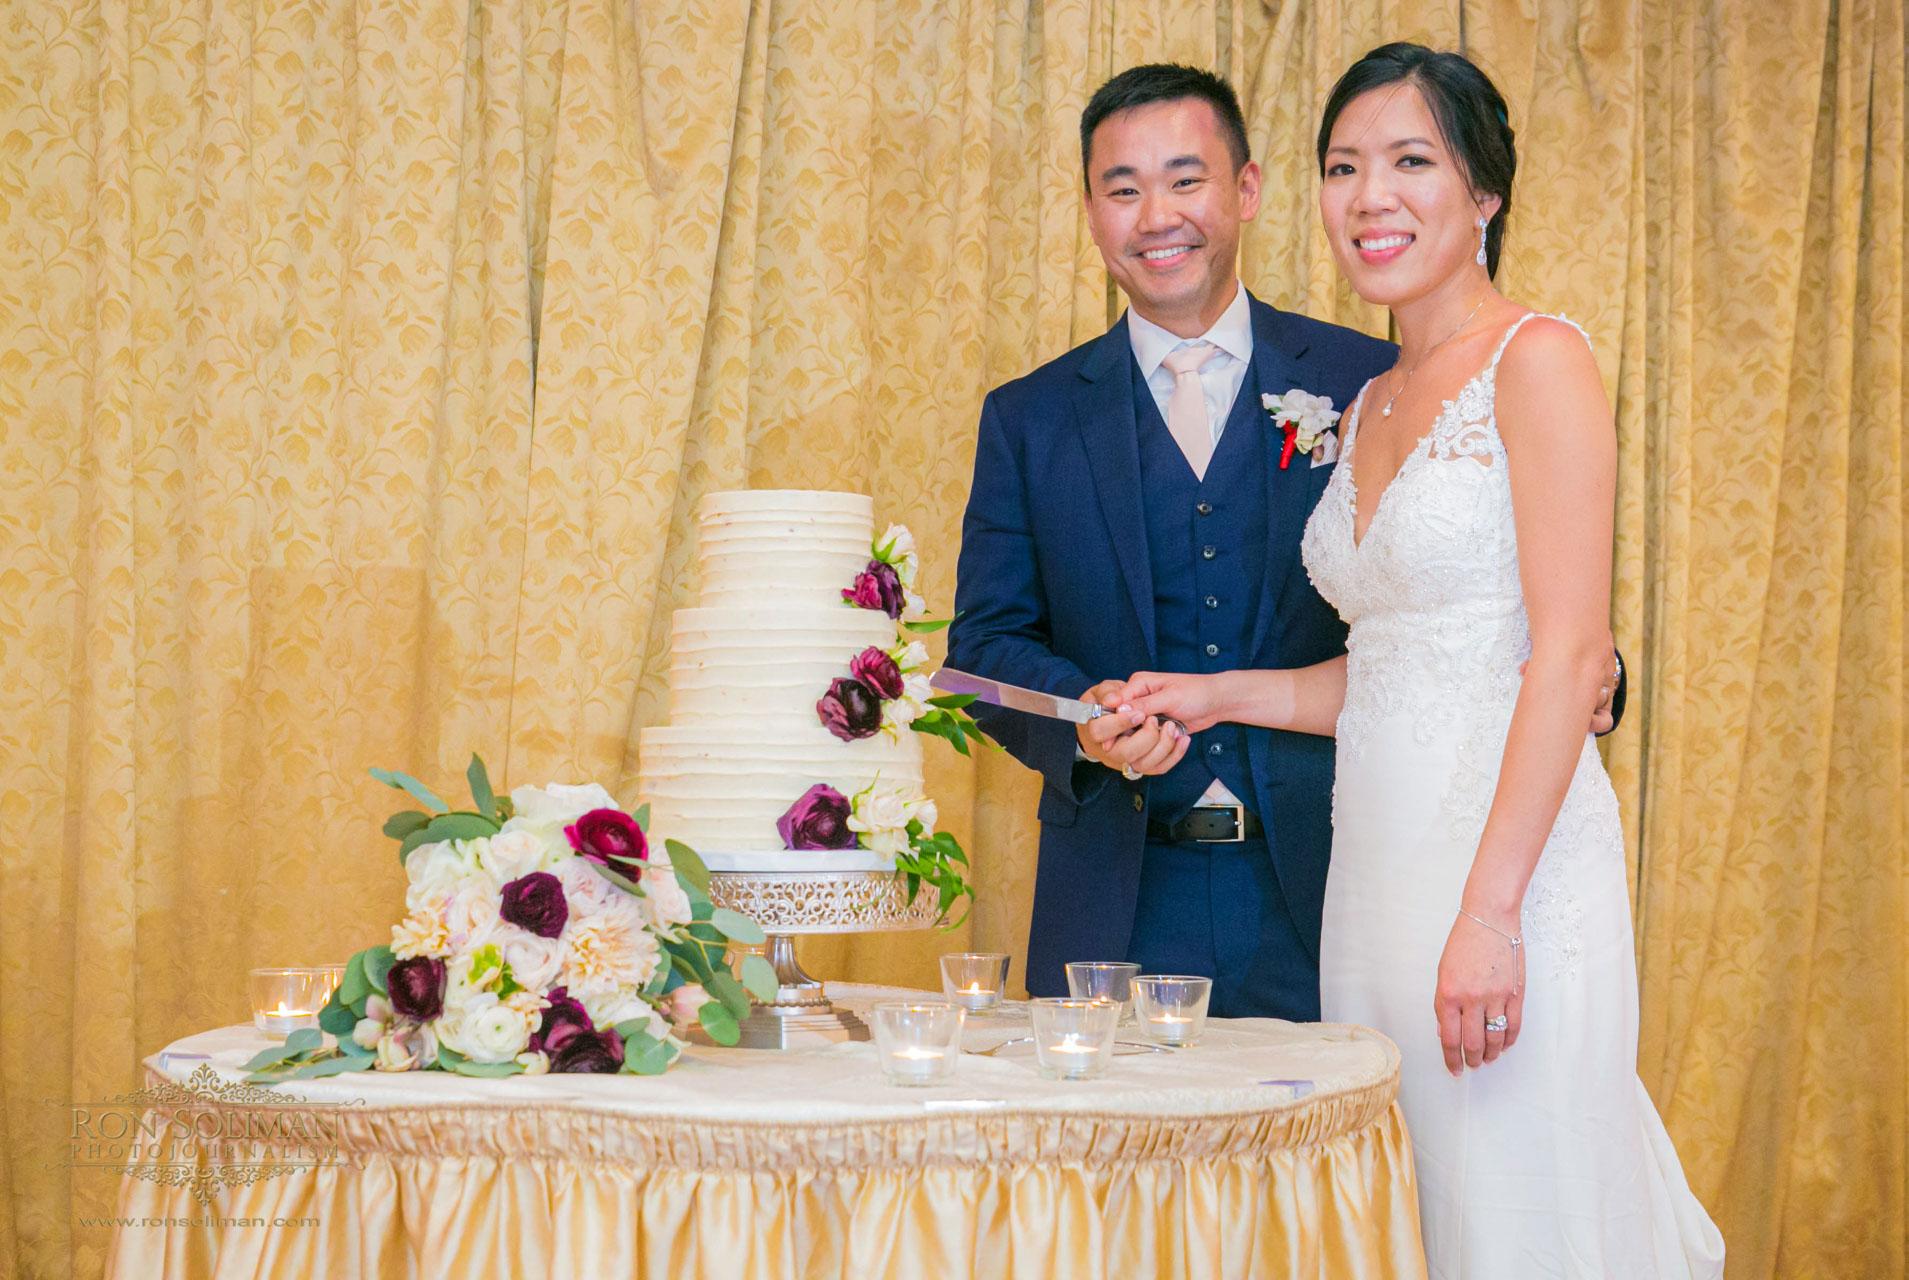 Brooklyn Bridge Park Wedding 39